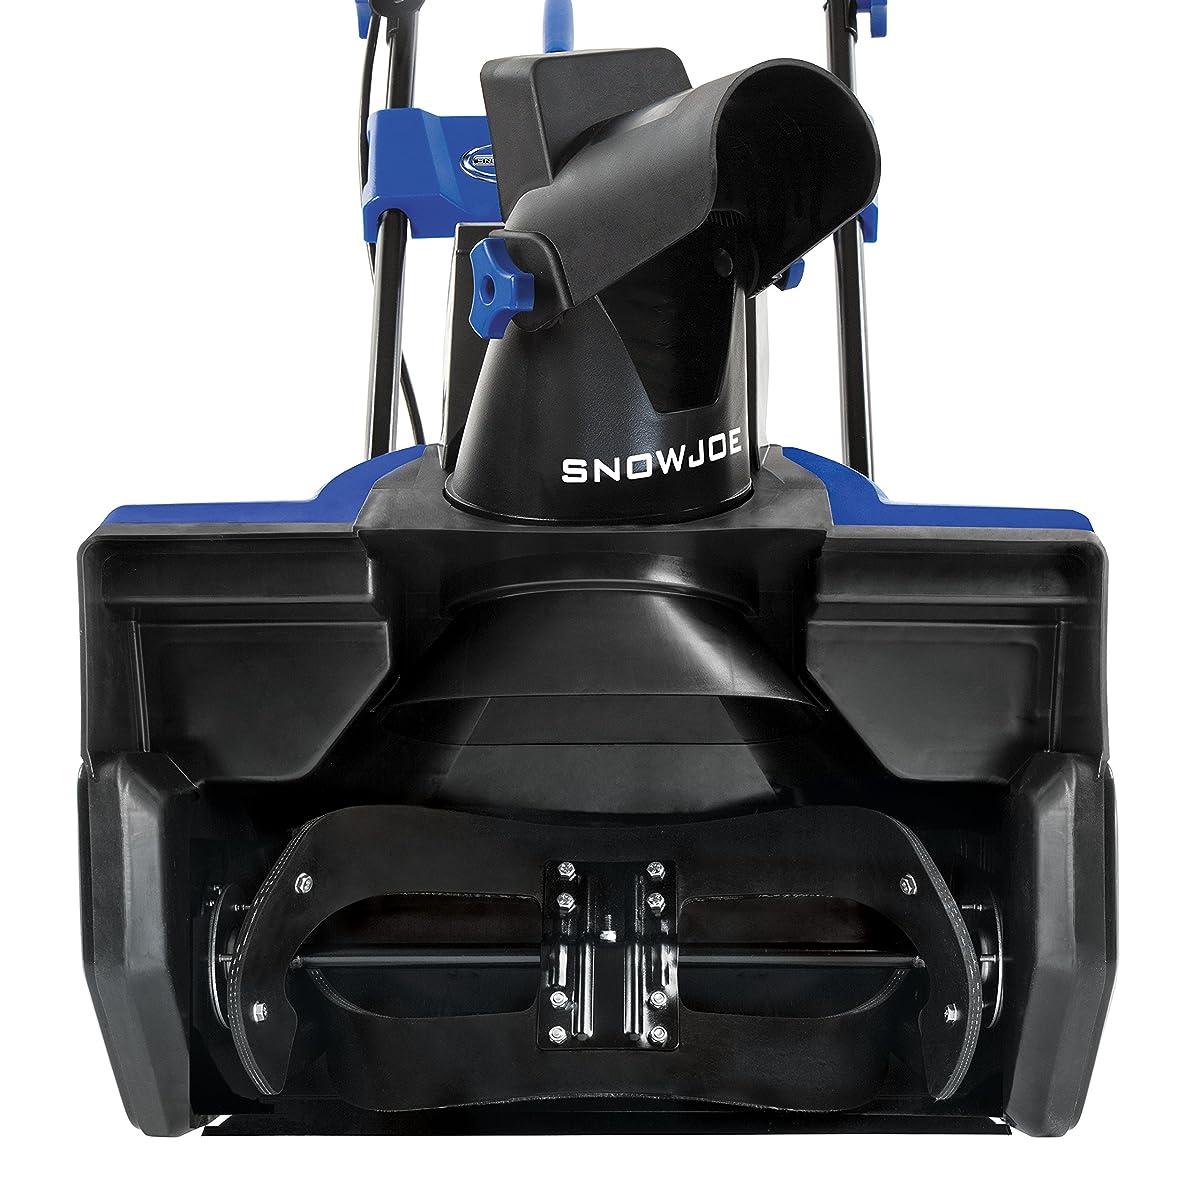 Snow Joe Ultra SJ625E 21-Inch 15-Amp Electric Snow Thrower